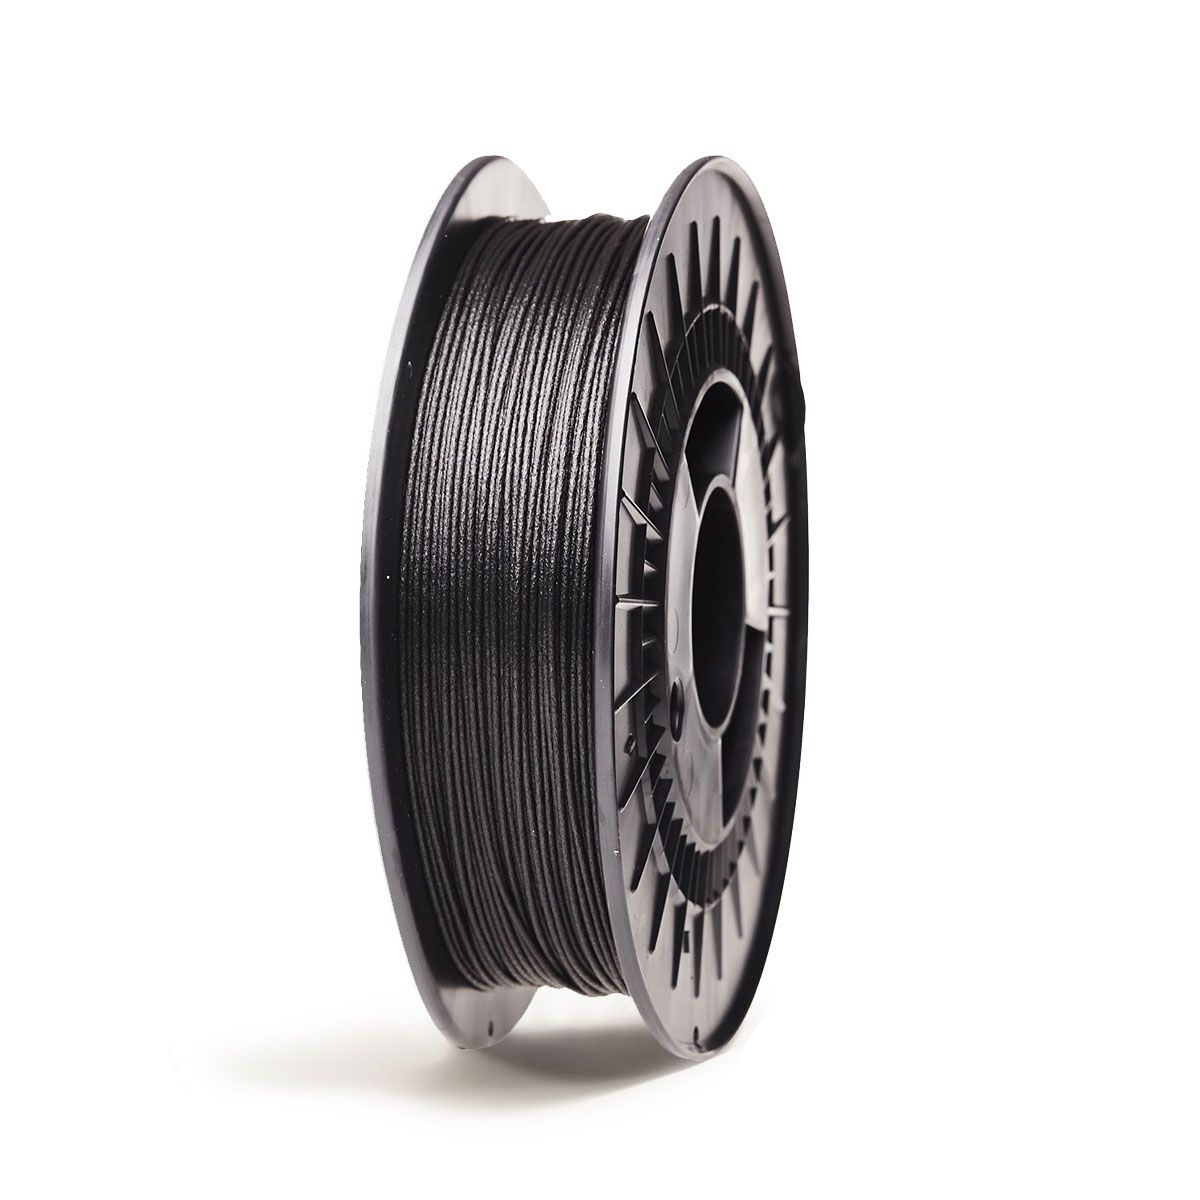 PA Filament   Color: Nylon Glass Fiber Black